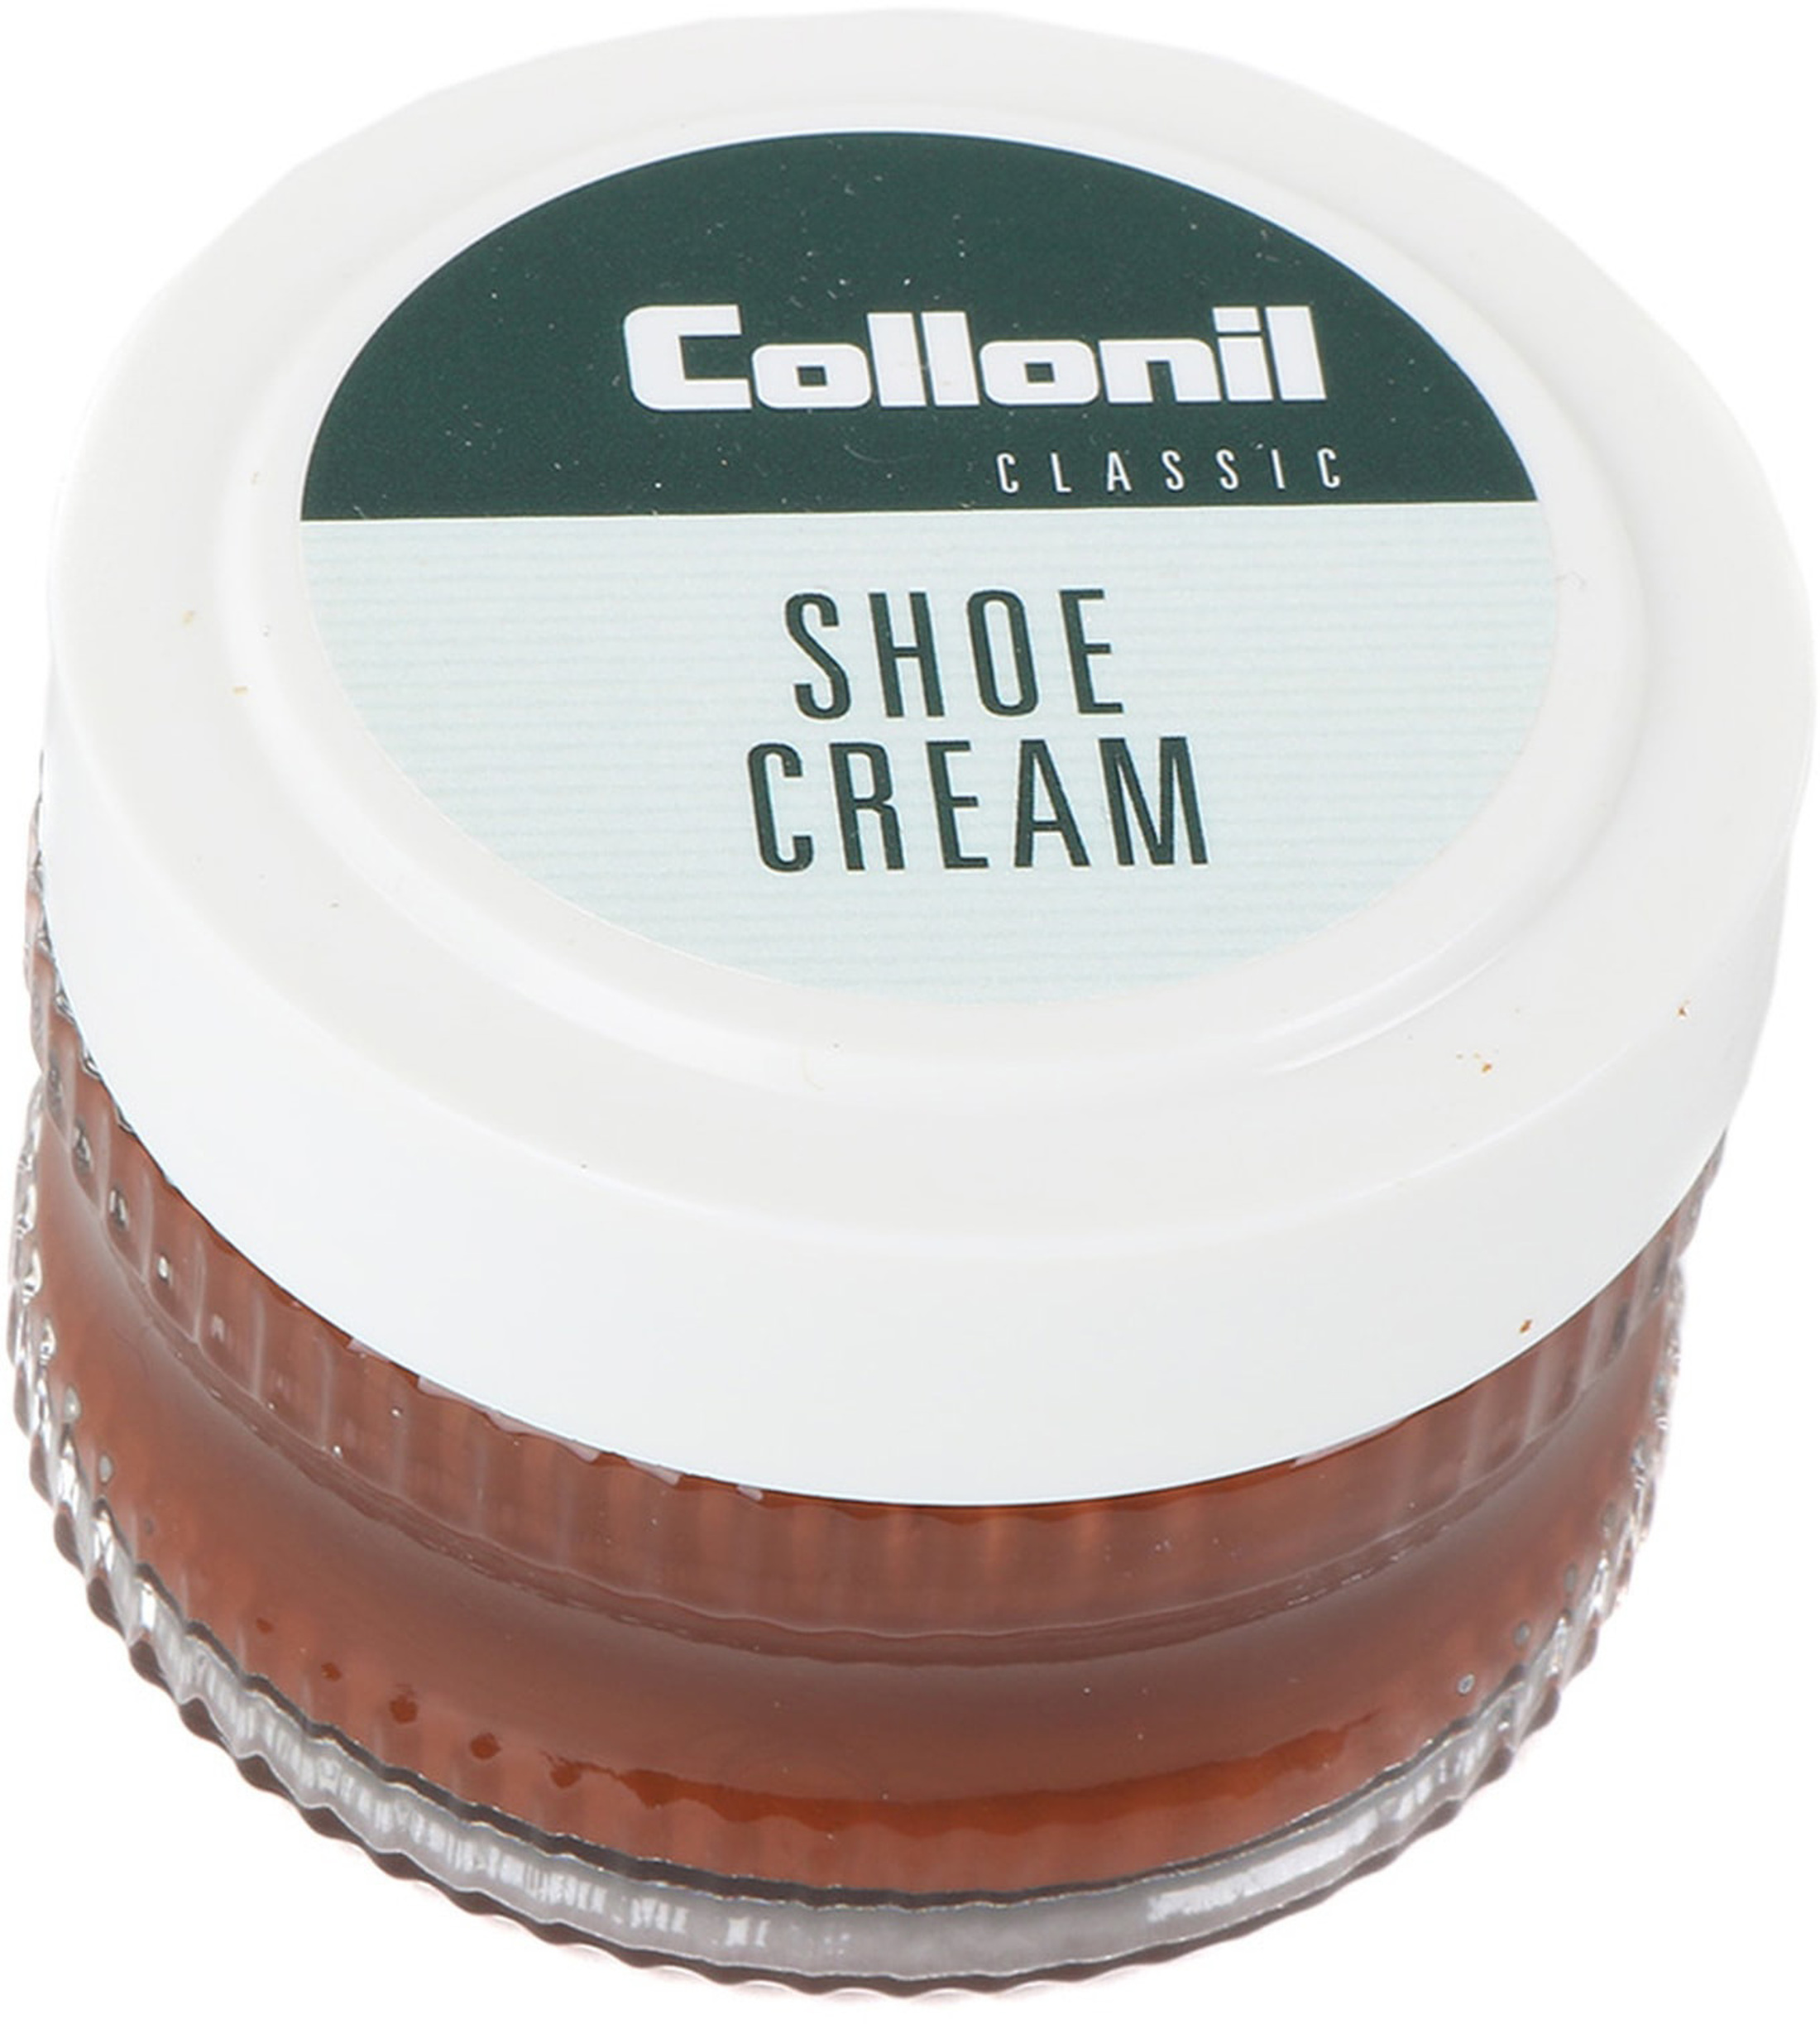 Collonil Shoe Cream Cognac foto 0